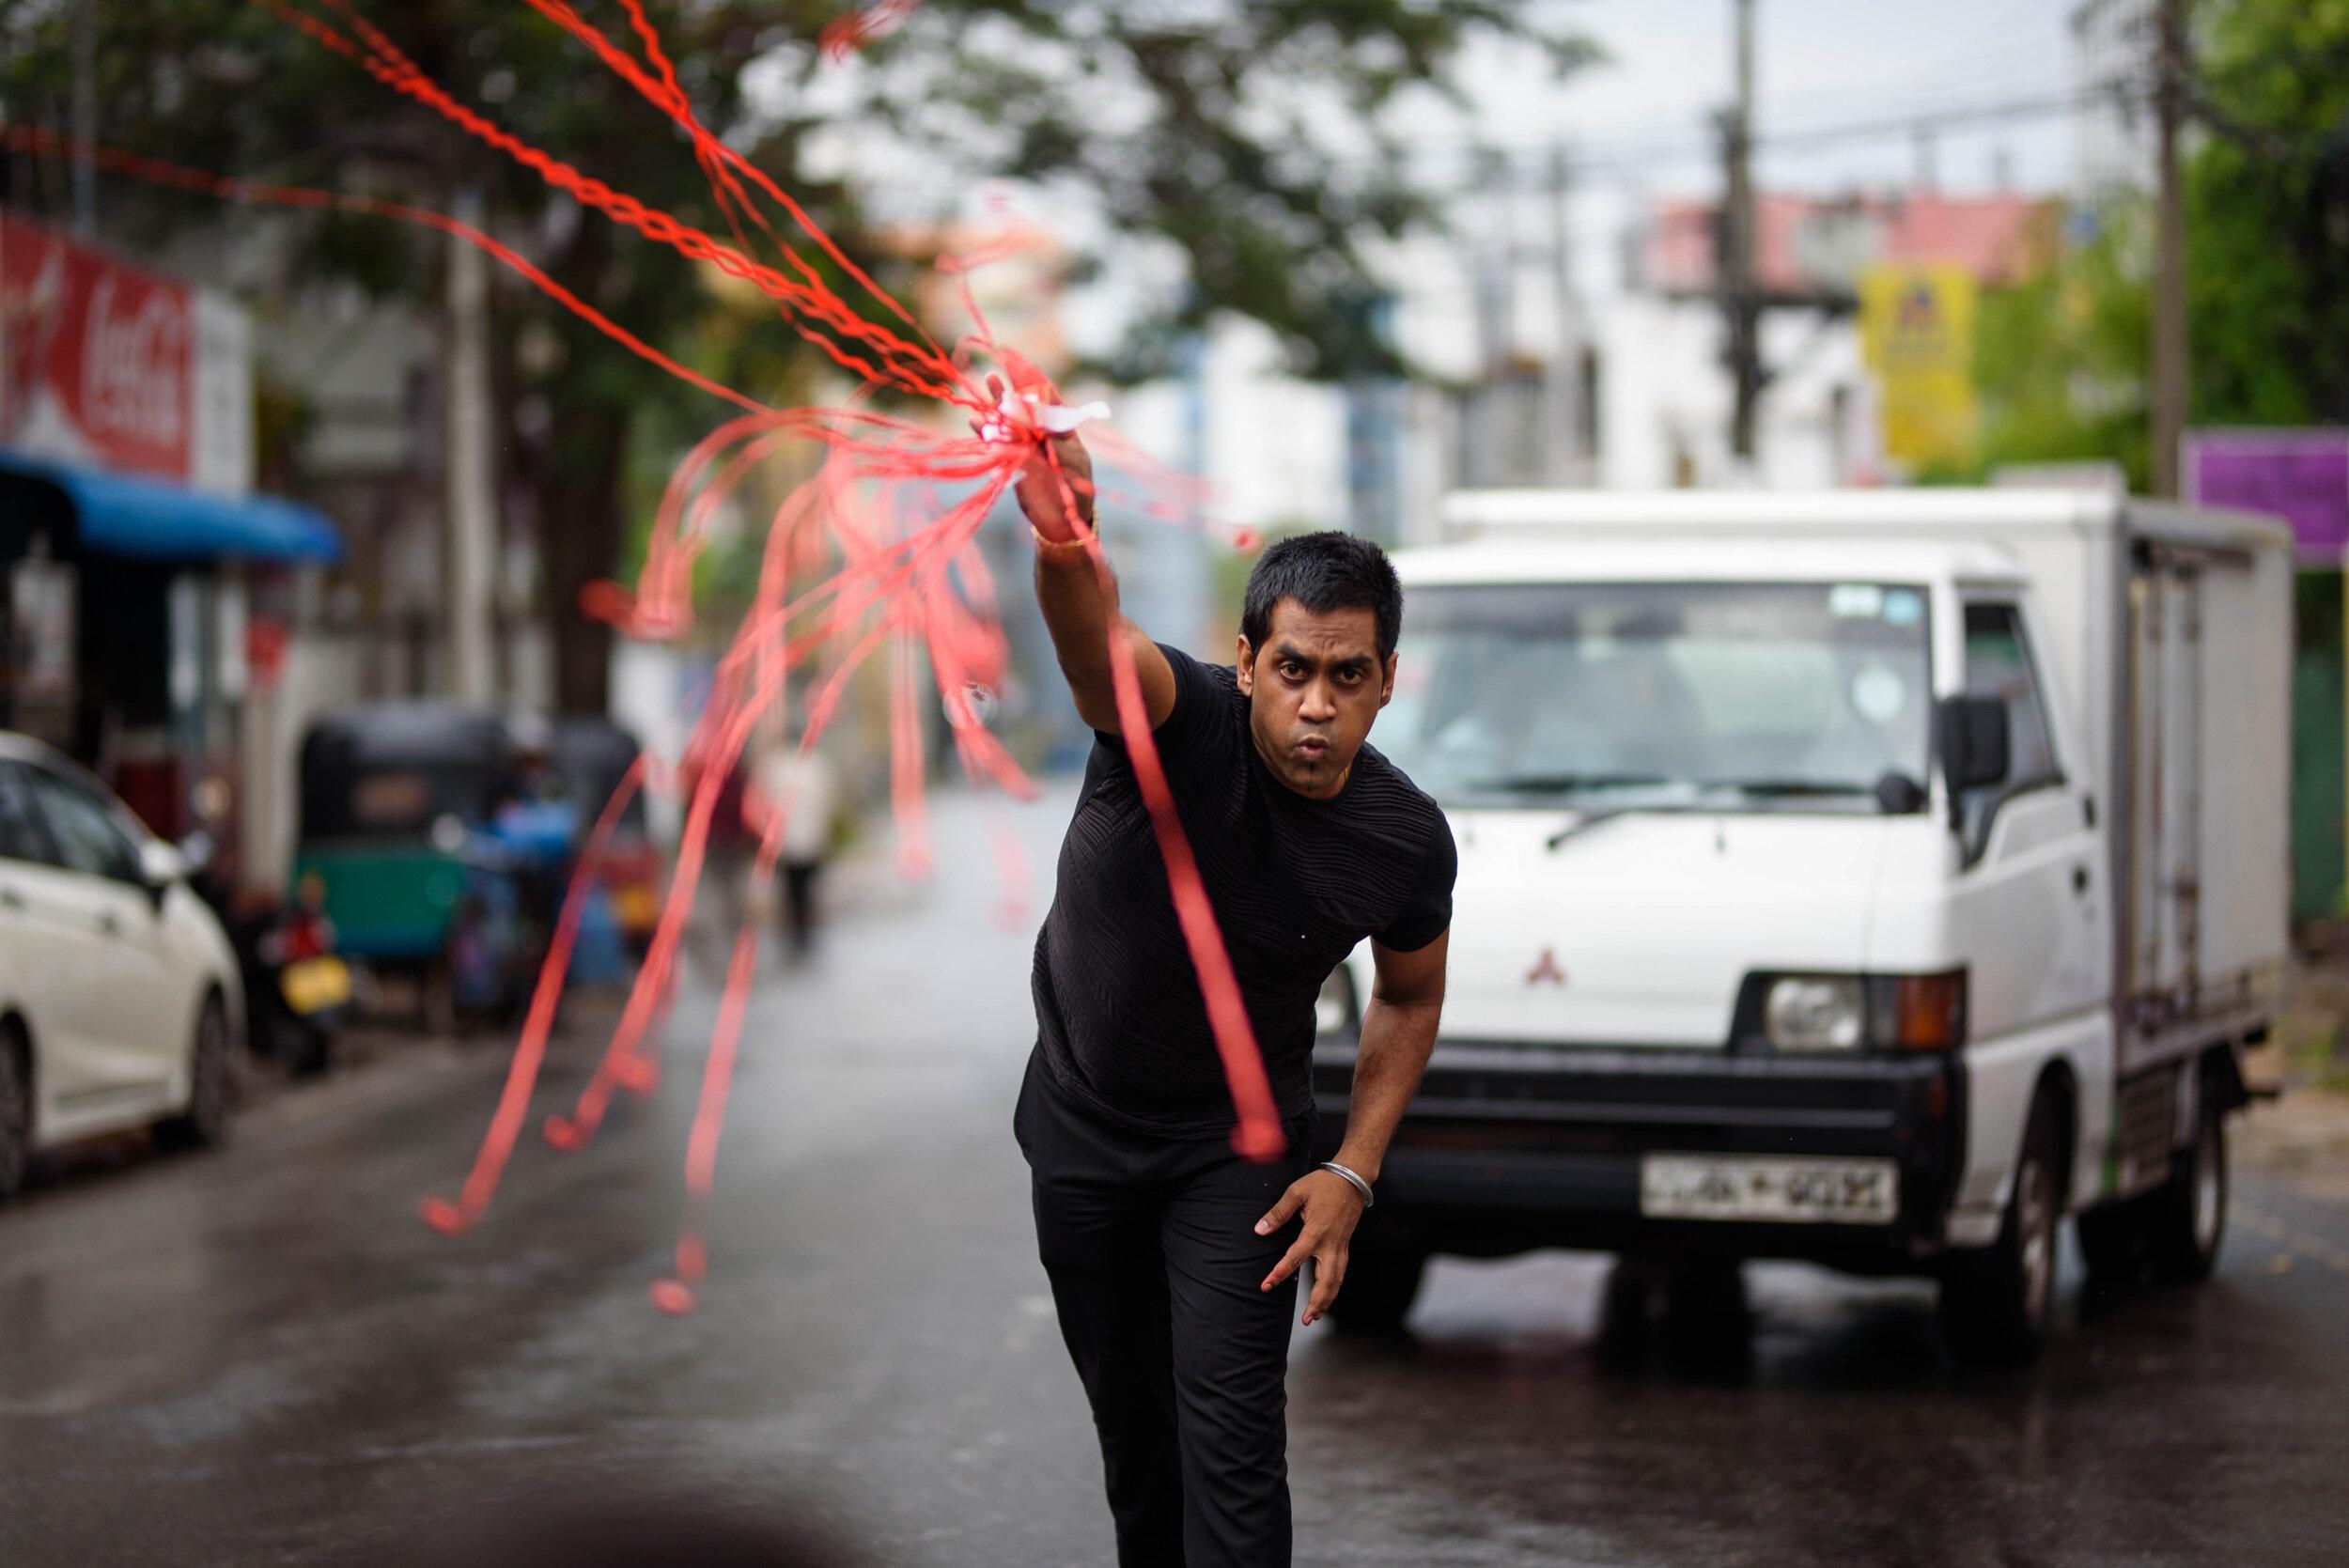 Hernandez – Magician, Performer, Uber driver | Colombo